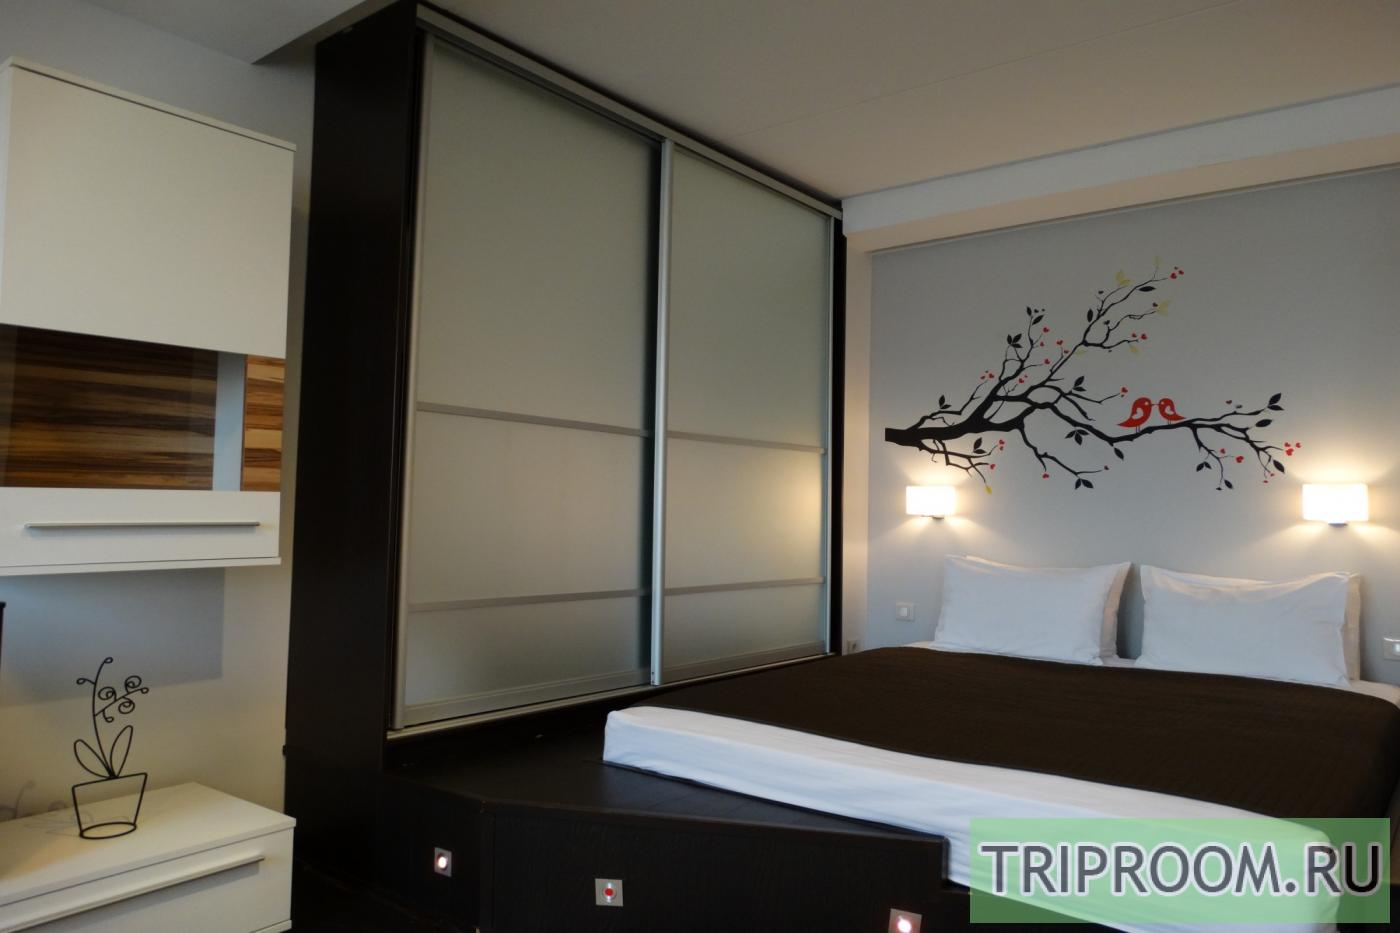 1-комнатная квартира посуточно (вариант № 22157), ул. Архитектора Власова улица, фото № 1